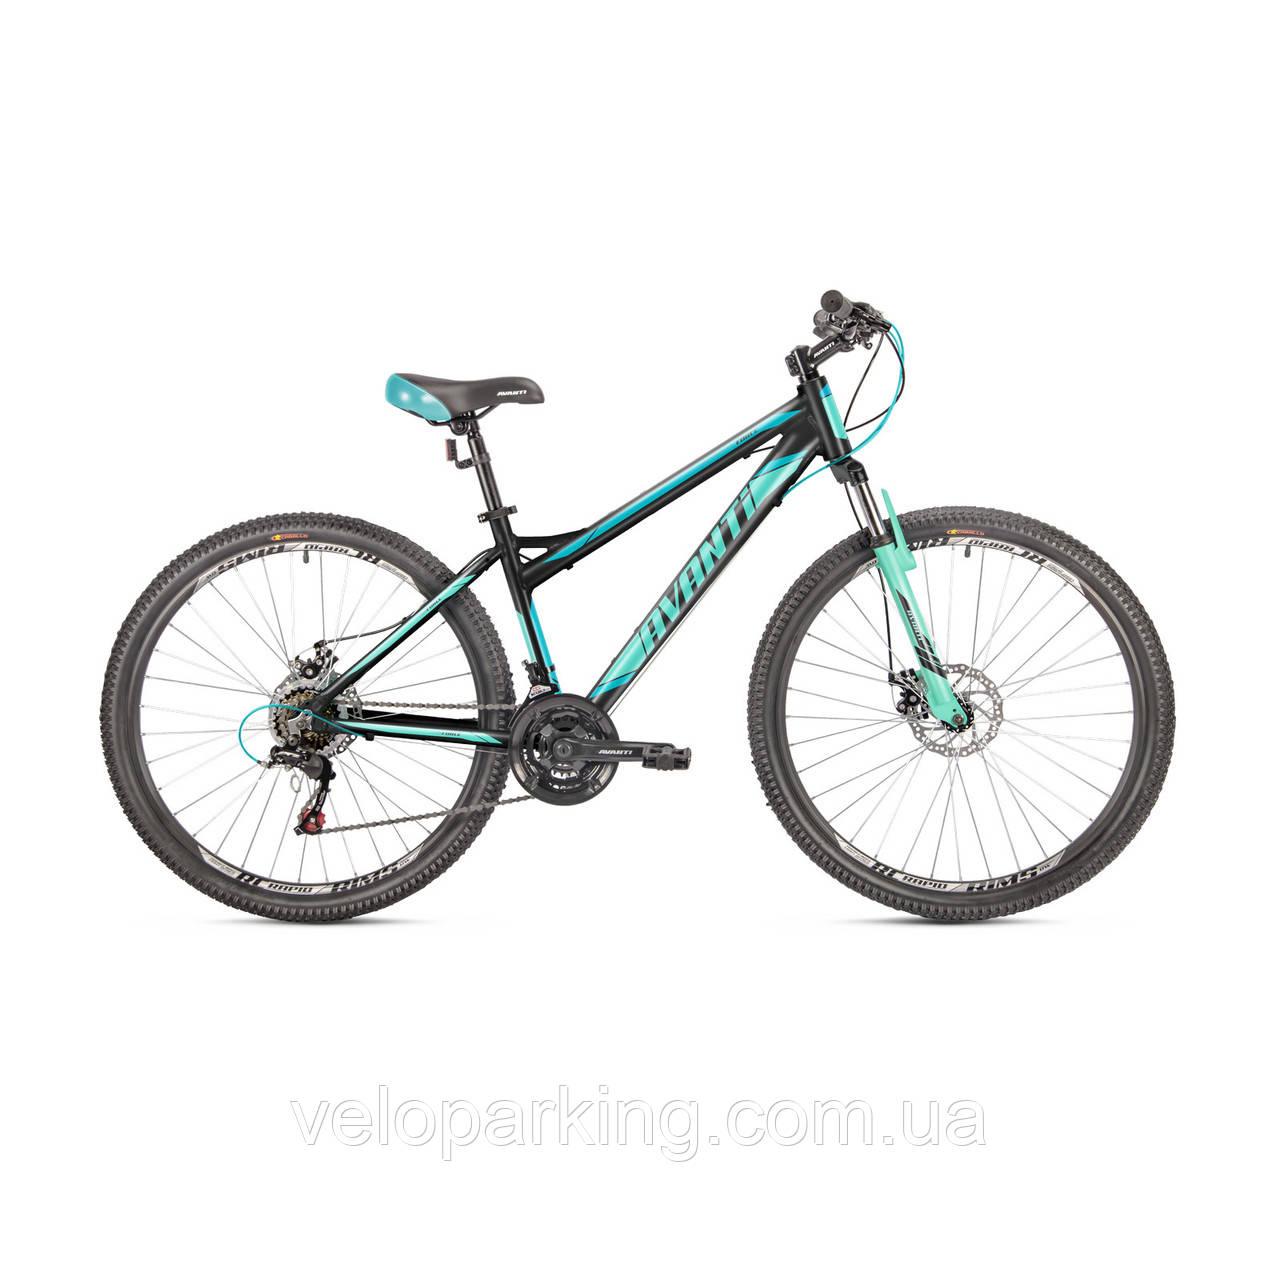 Горный дамский велосипед Avanti Force 27.5 (2018) DD new